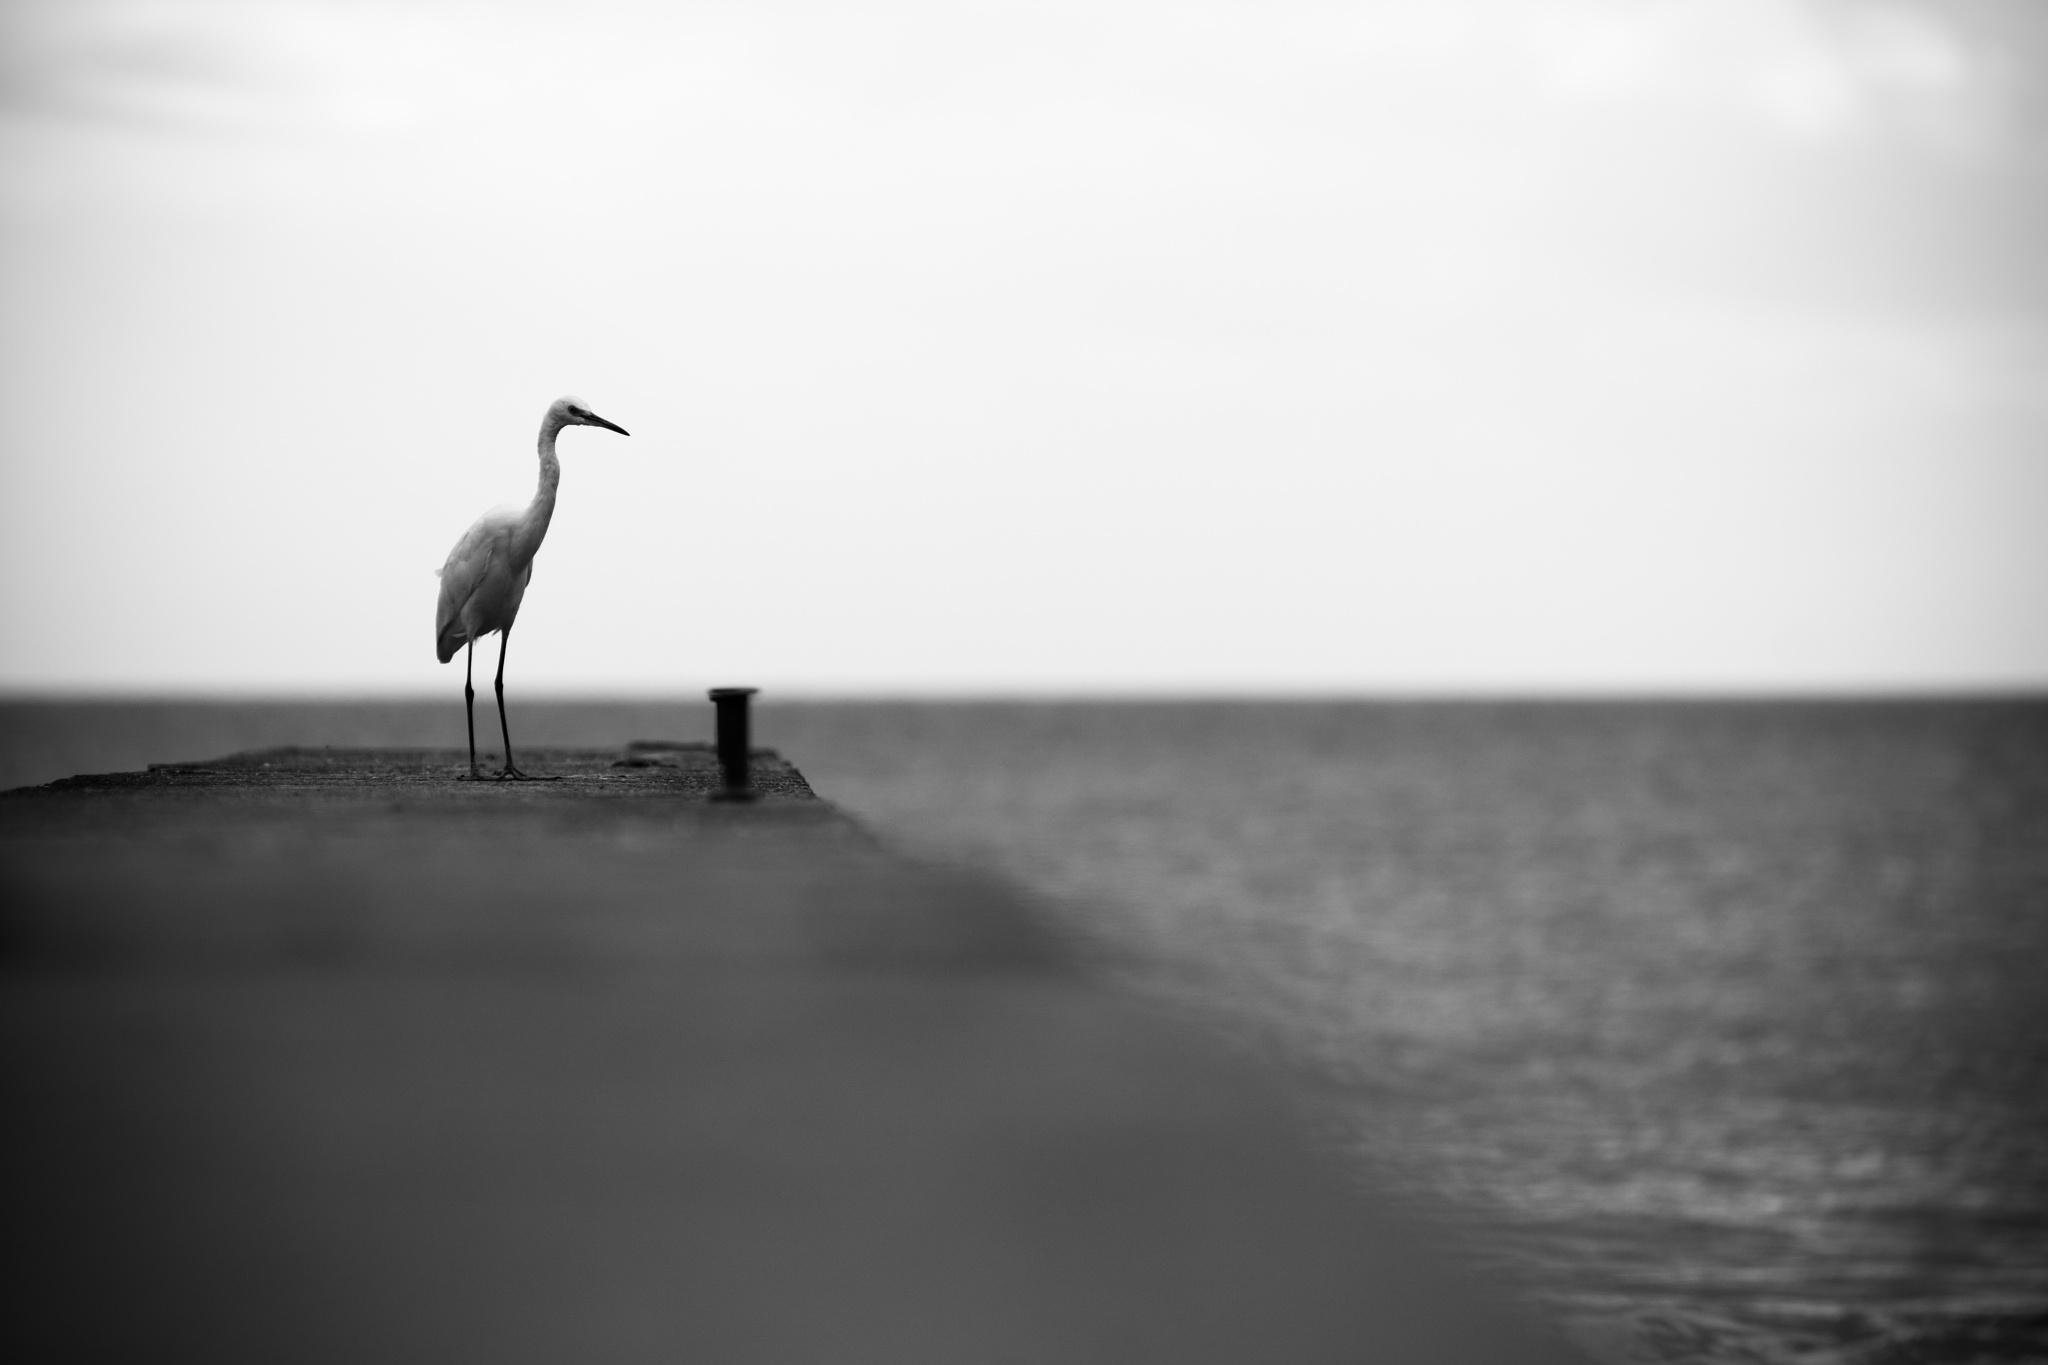 Fauna de playa by pratofrancisco